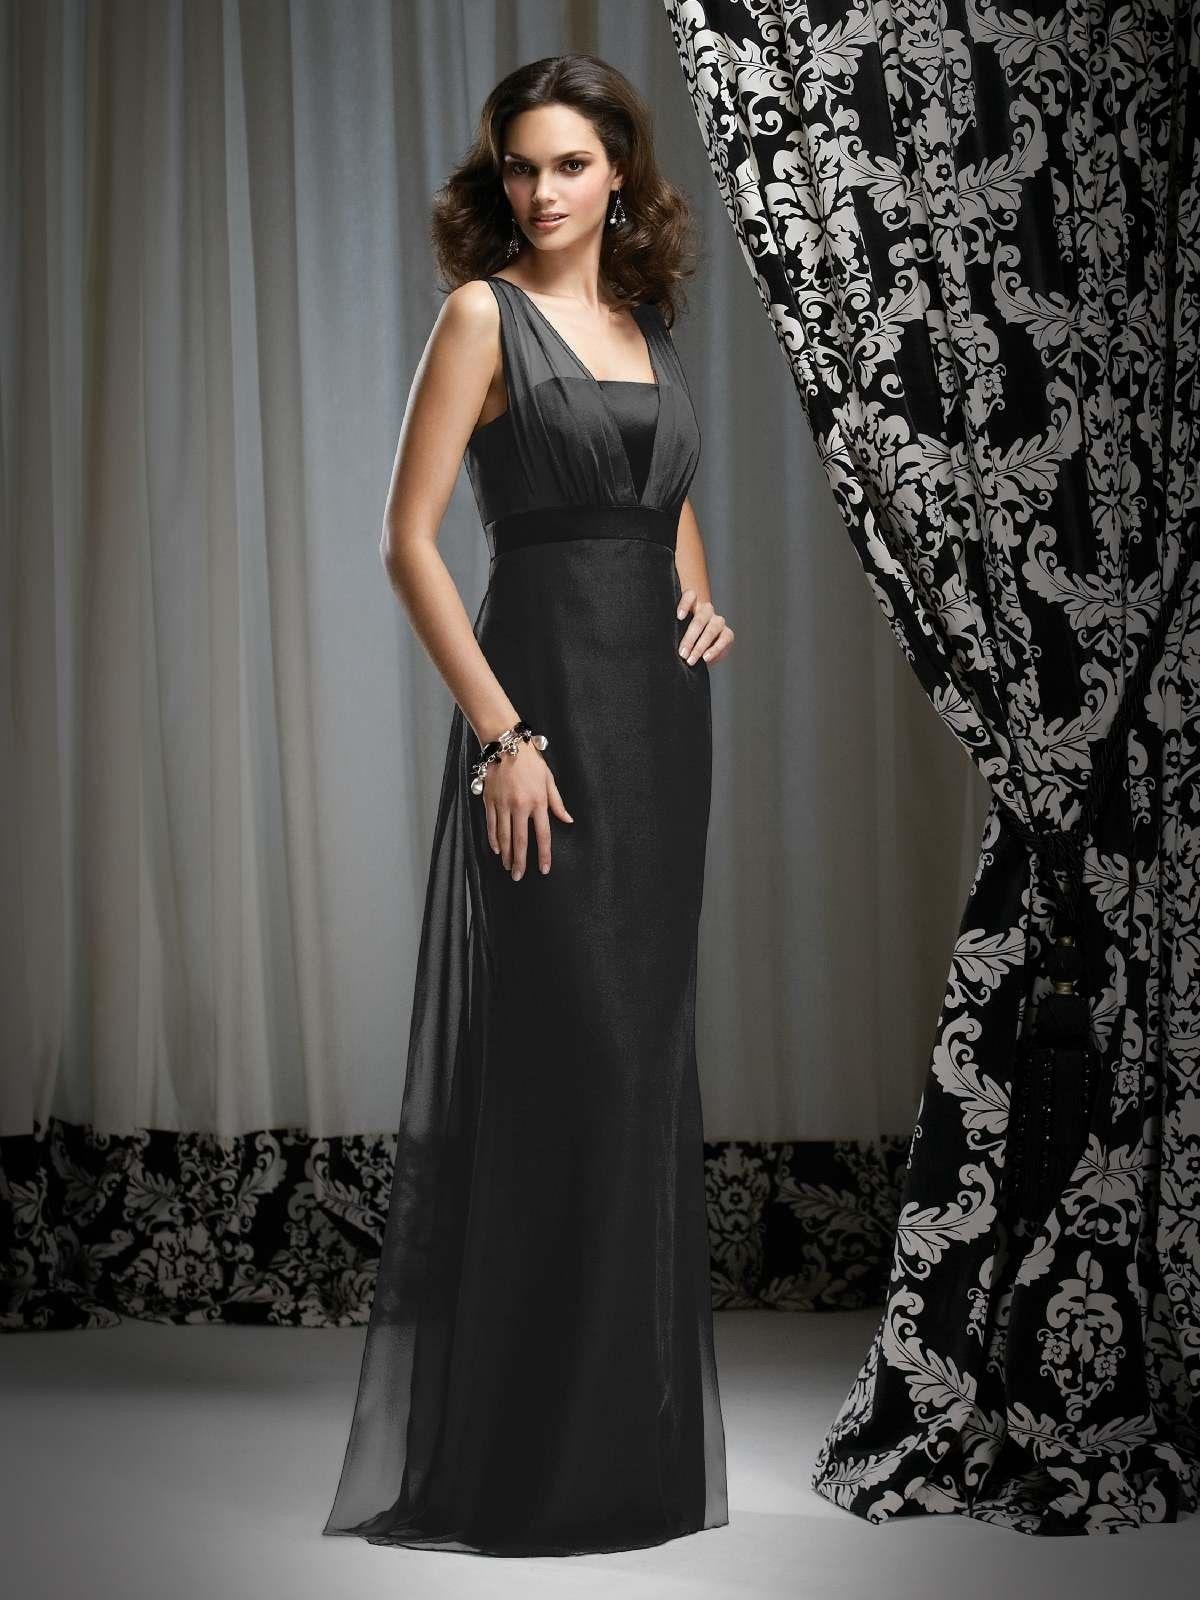 Black Chiffon Sheath Floor Length Bridesmaid Mother Of The Bride Dress With Straps Wedding